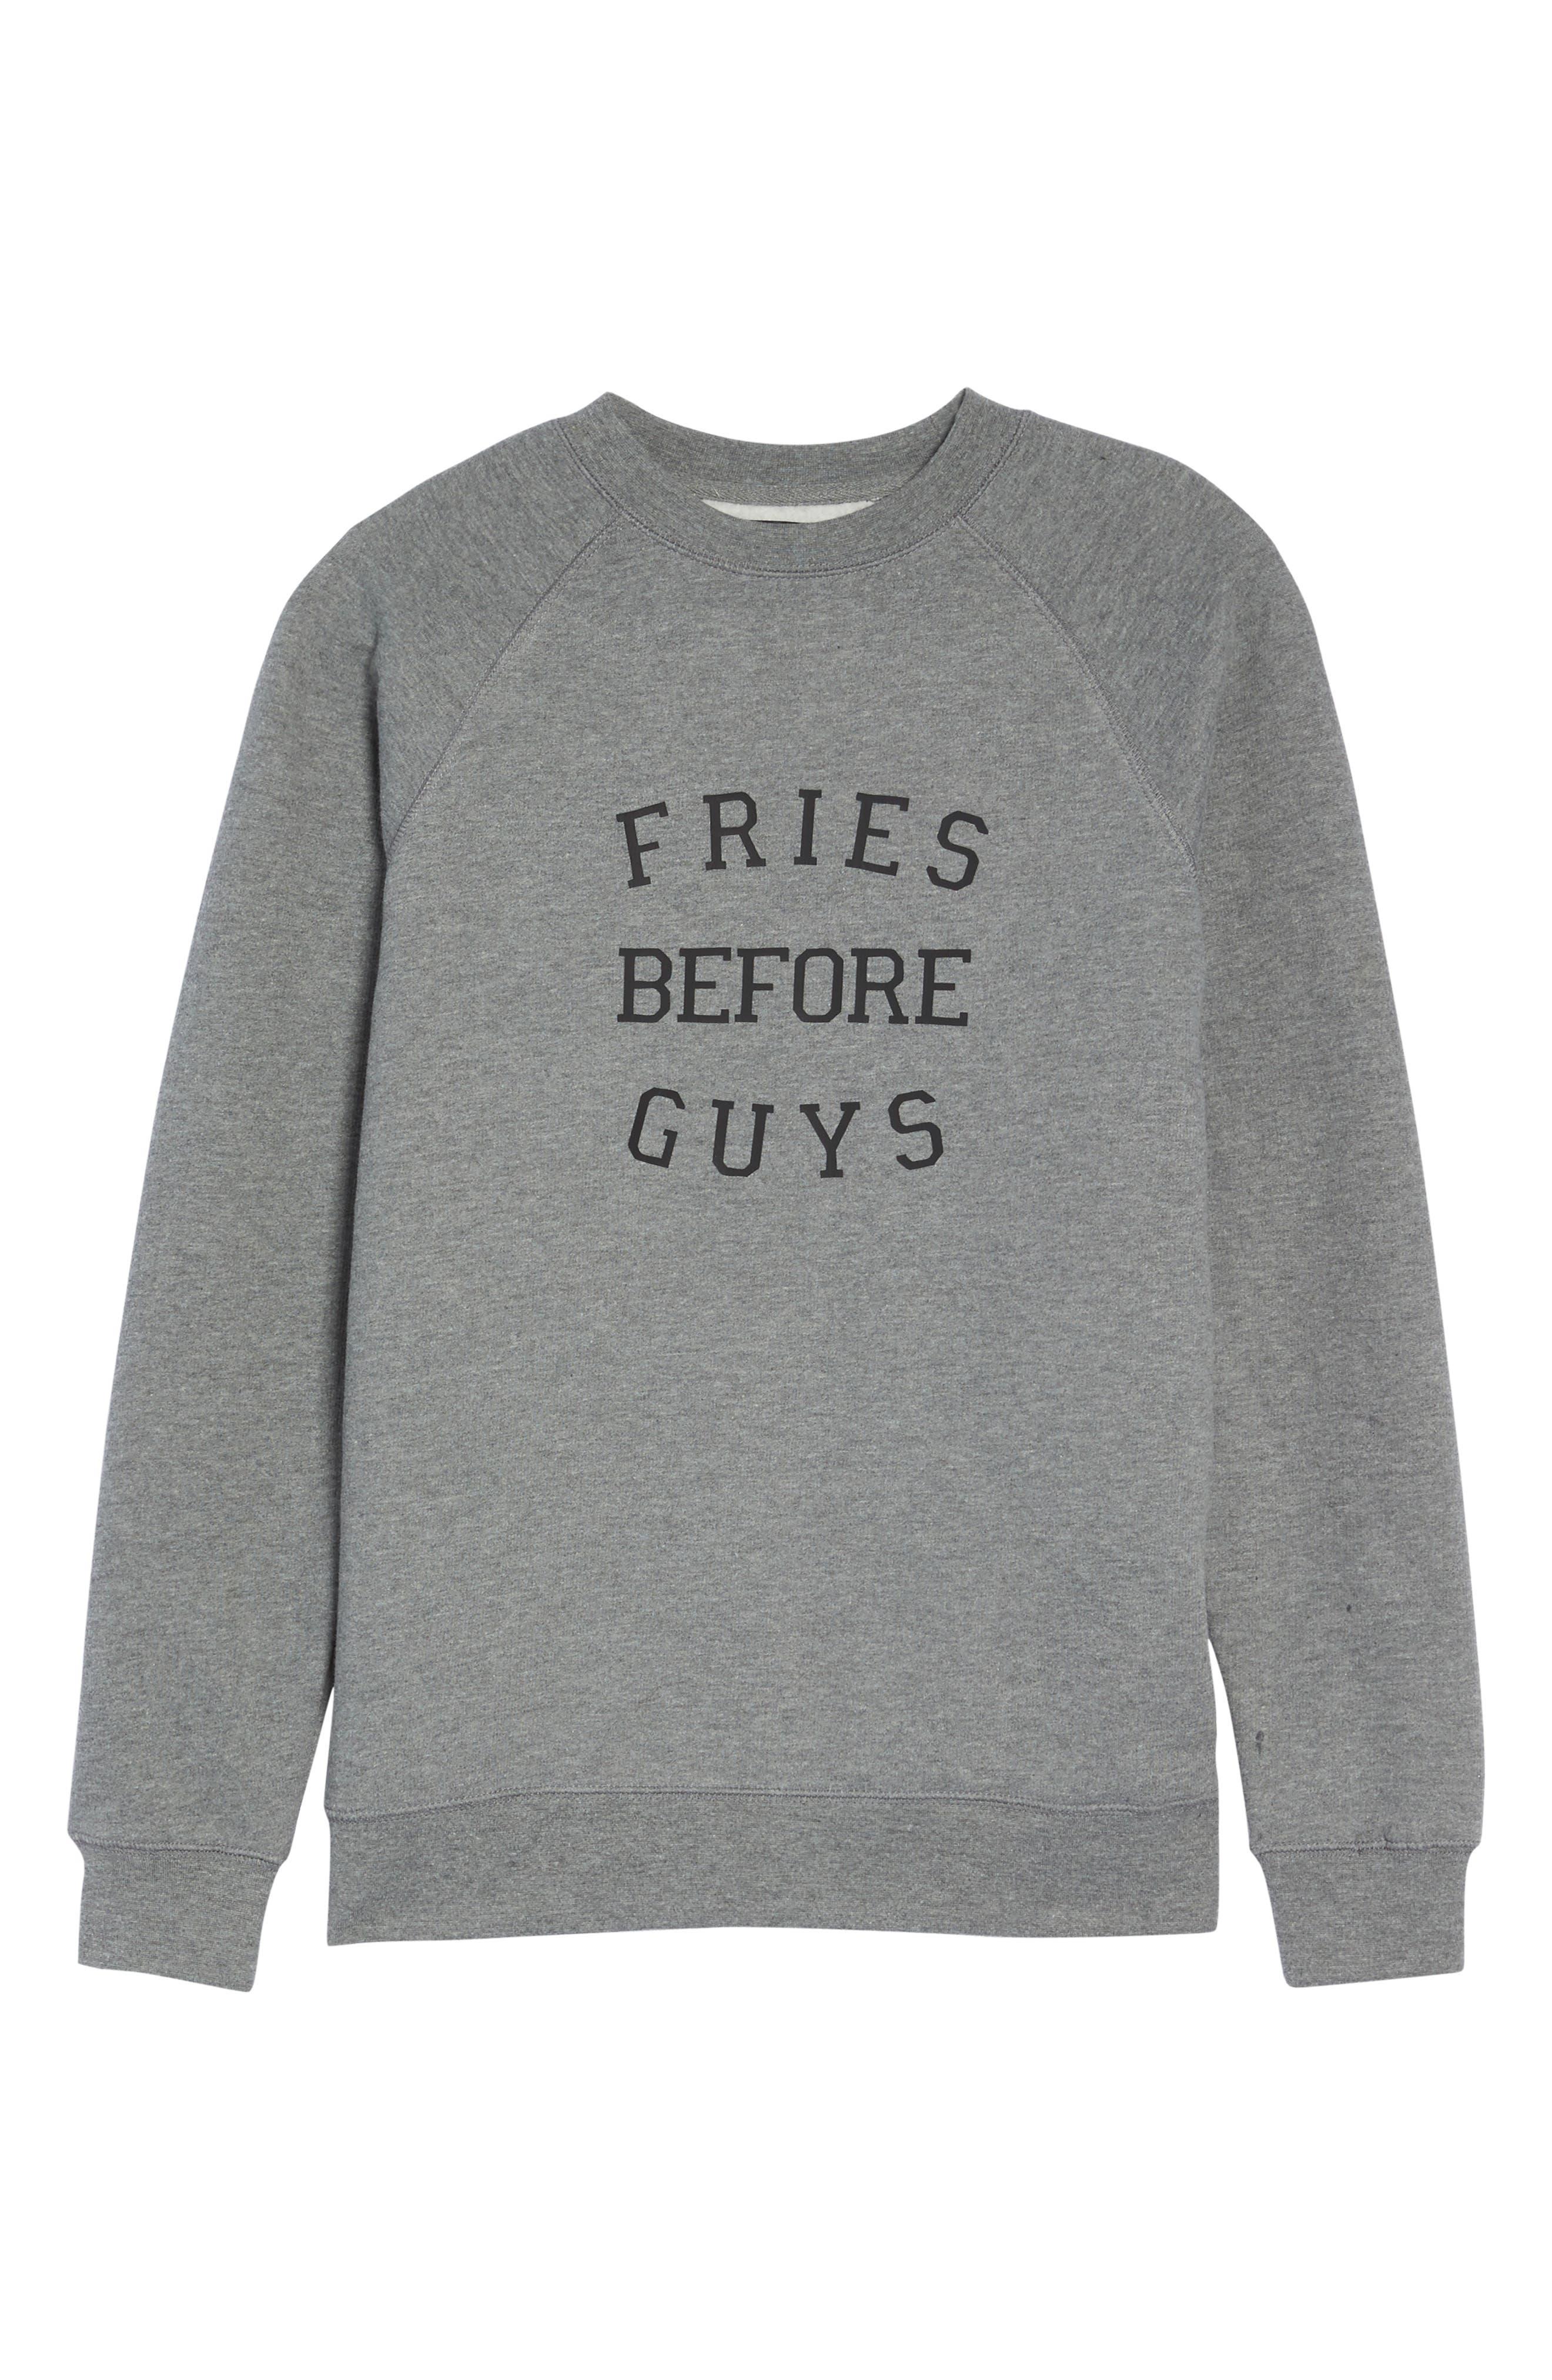 Fries Before Guys Sweatshirt,                             Alternate thumbnail 6, color,                             020